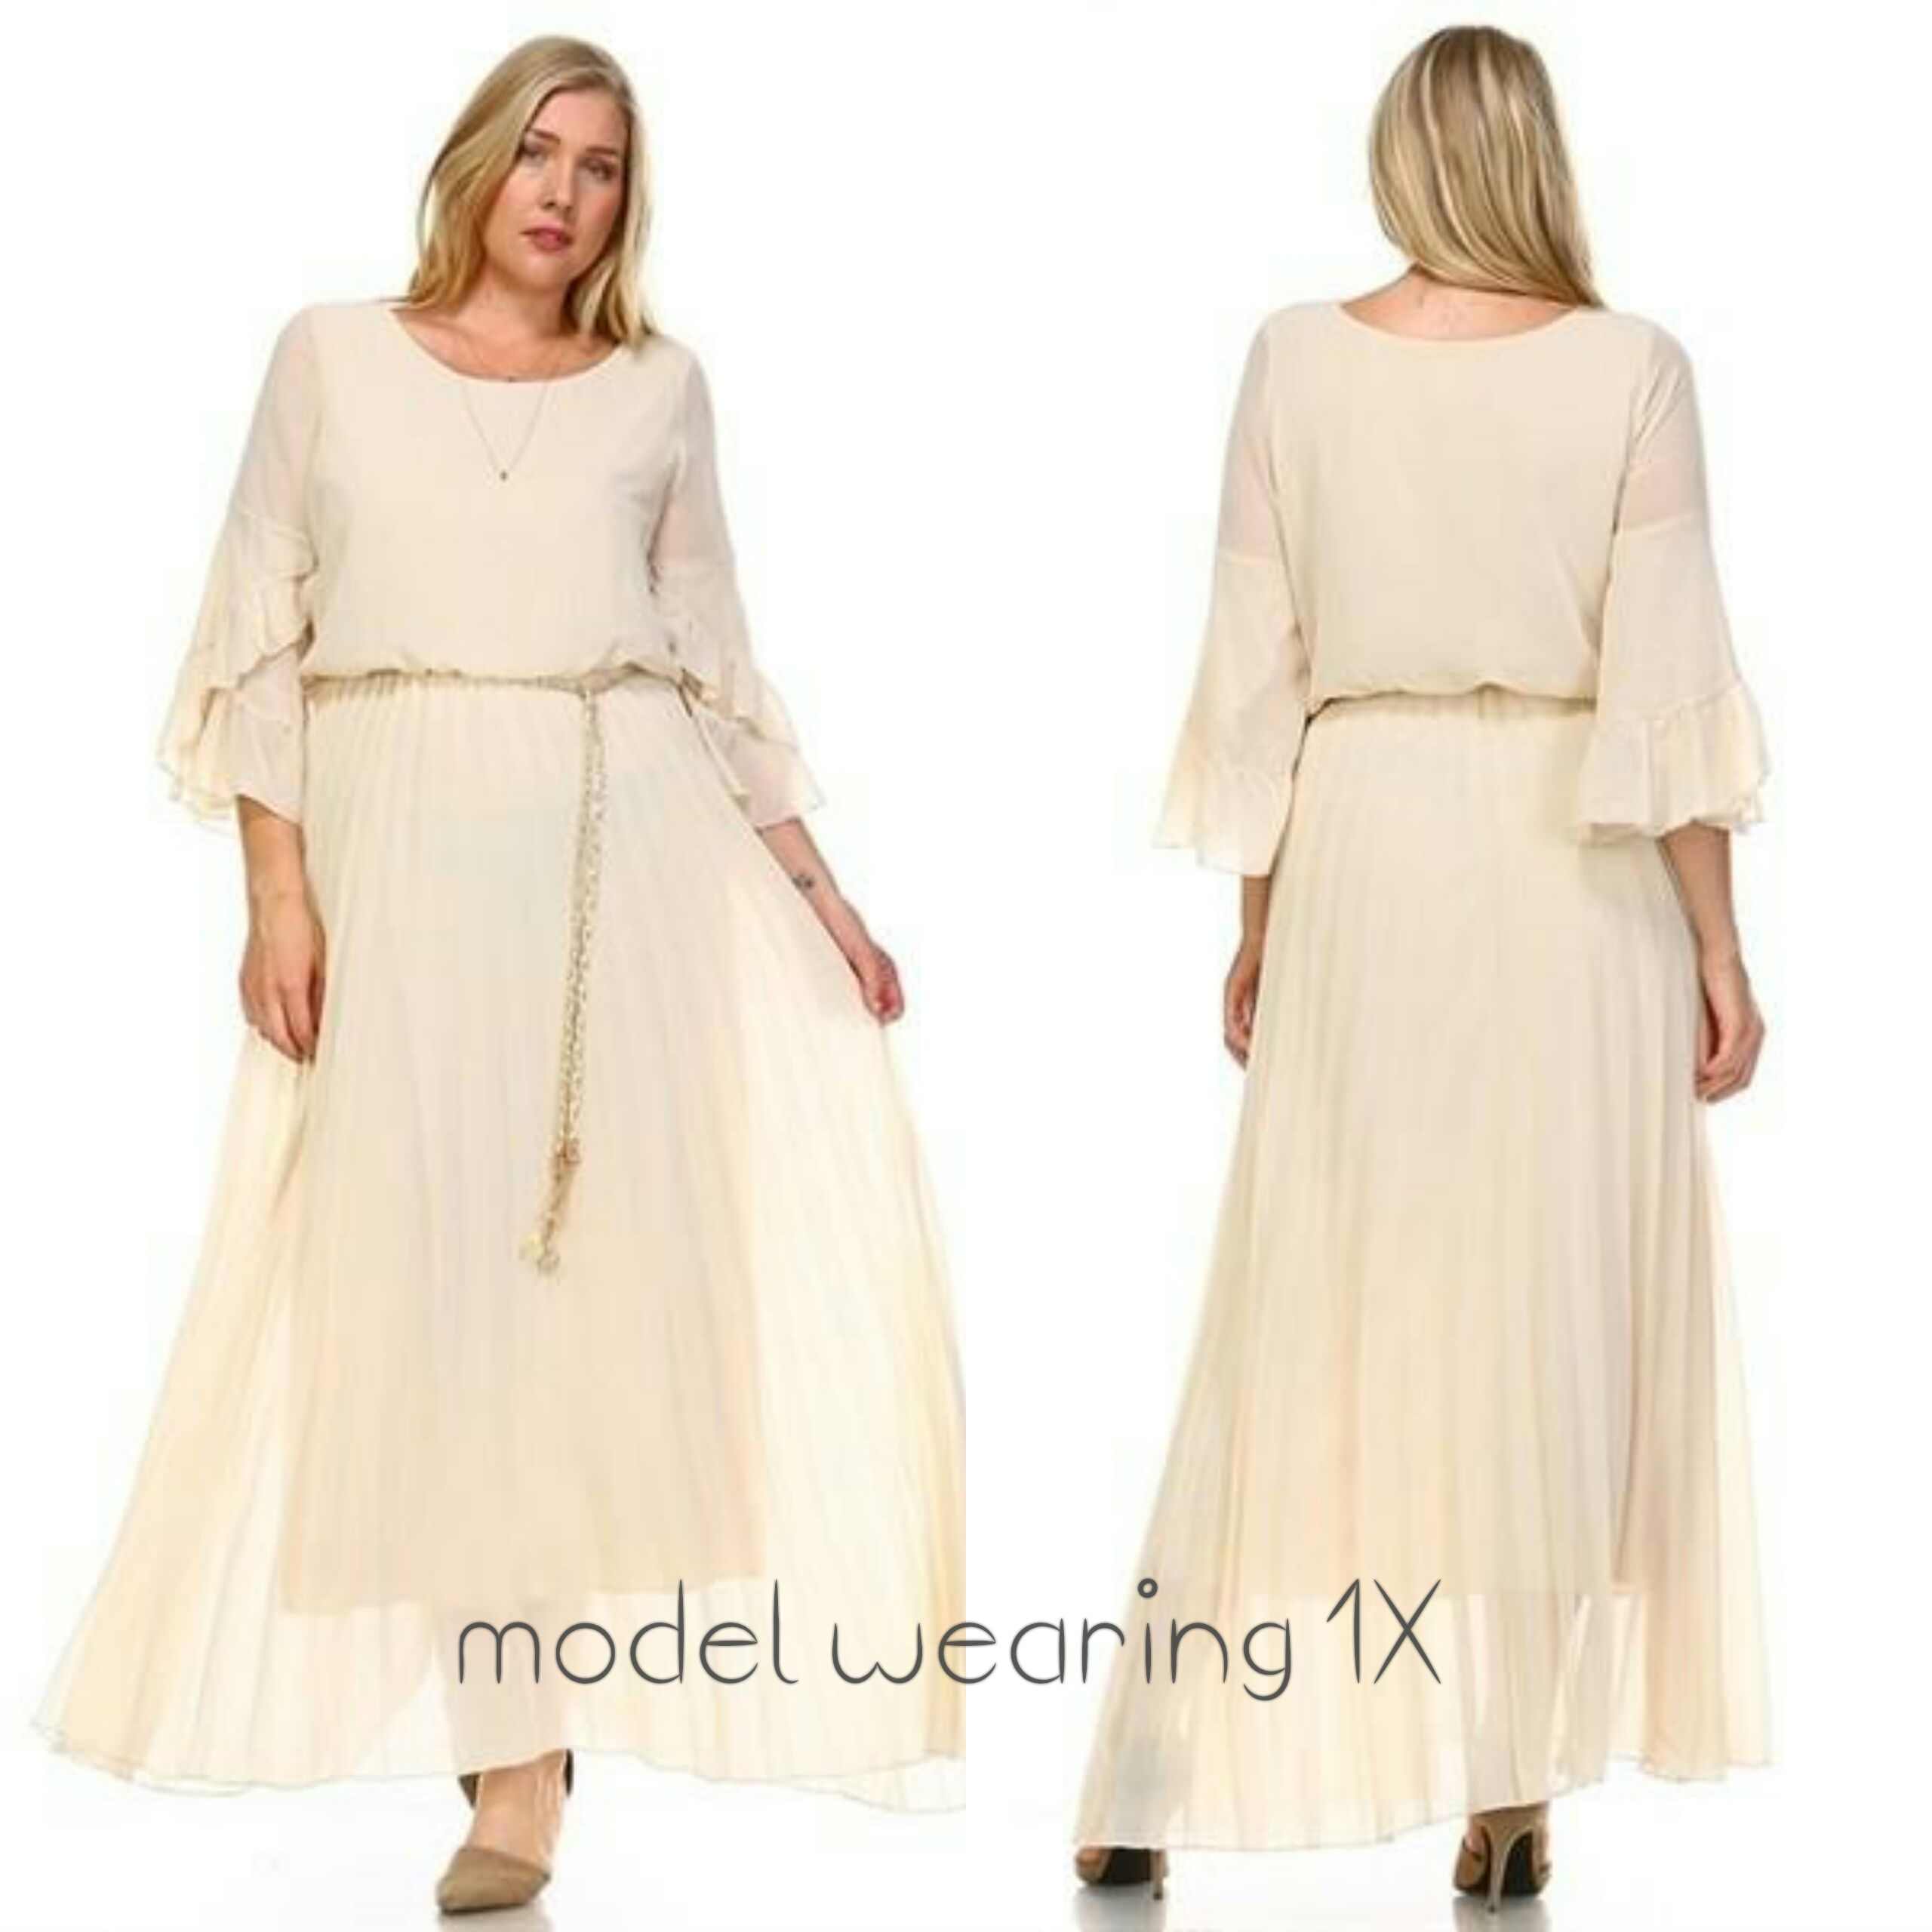 Xo maxi boutique u goddess maxi dress in plus size dresses in